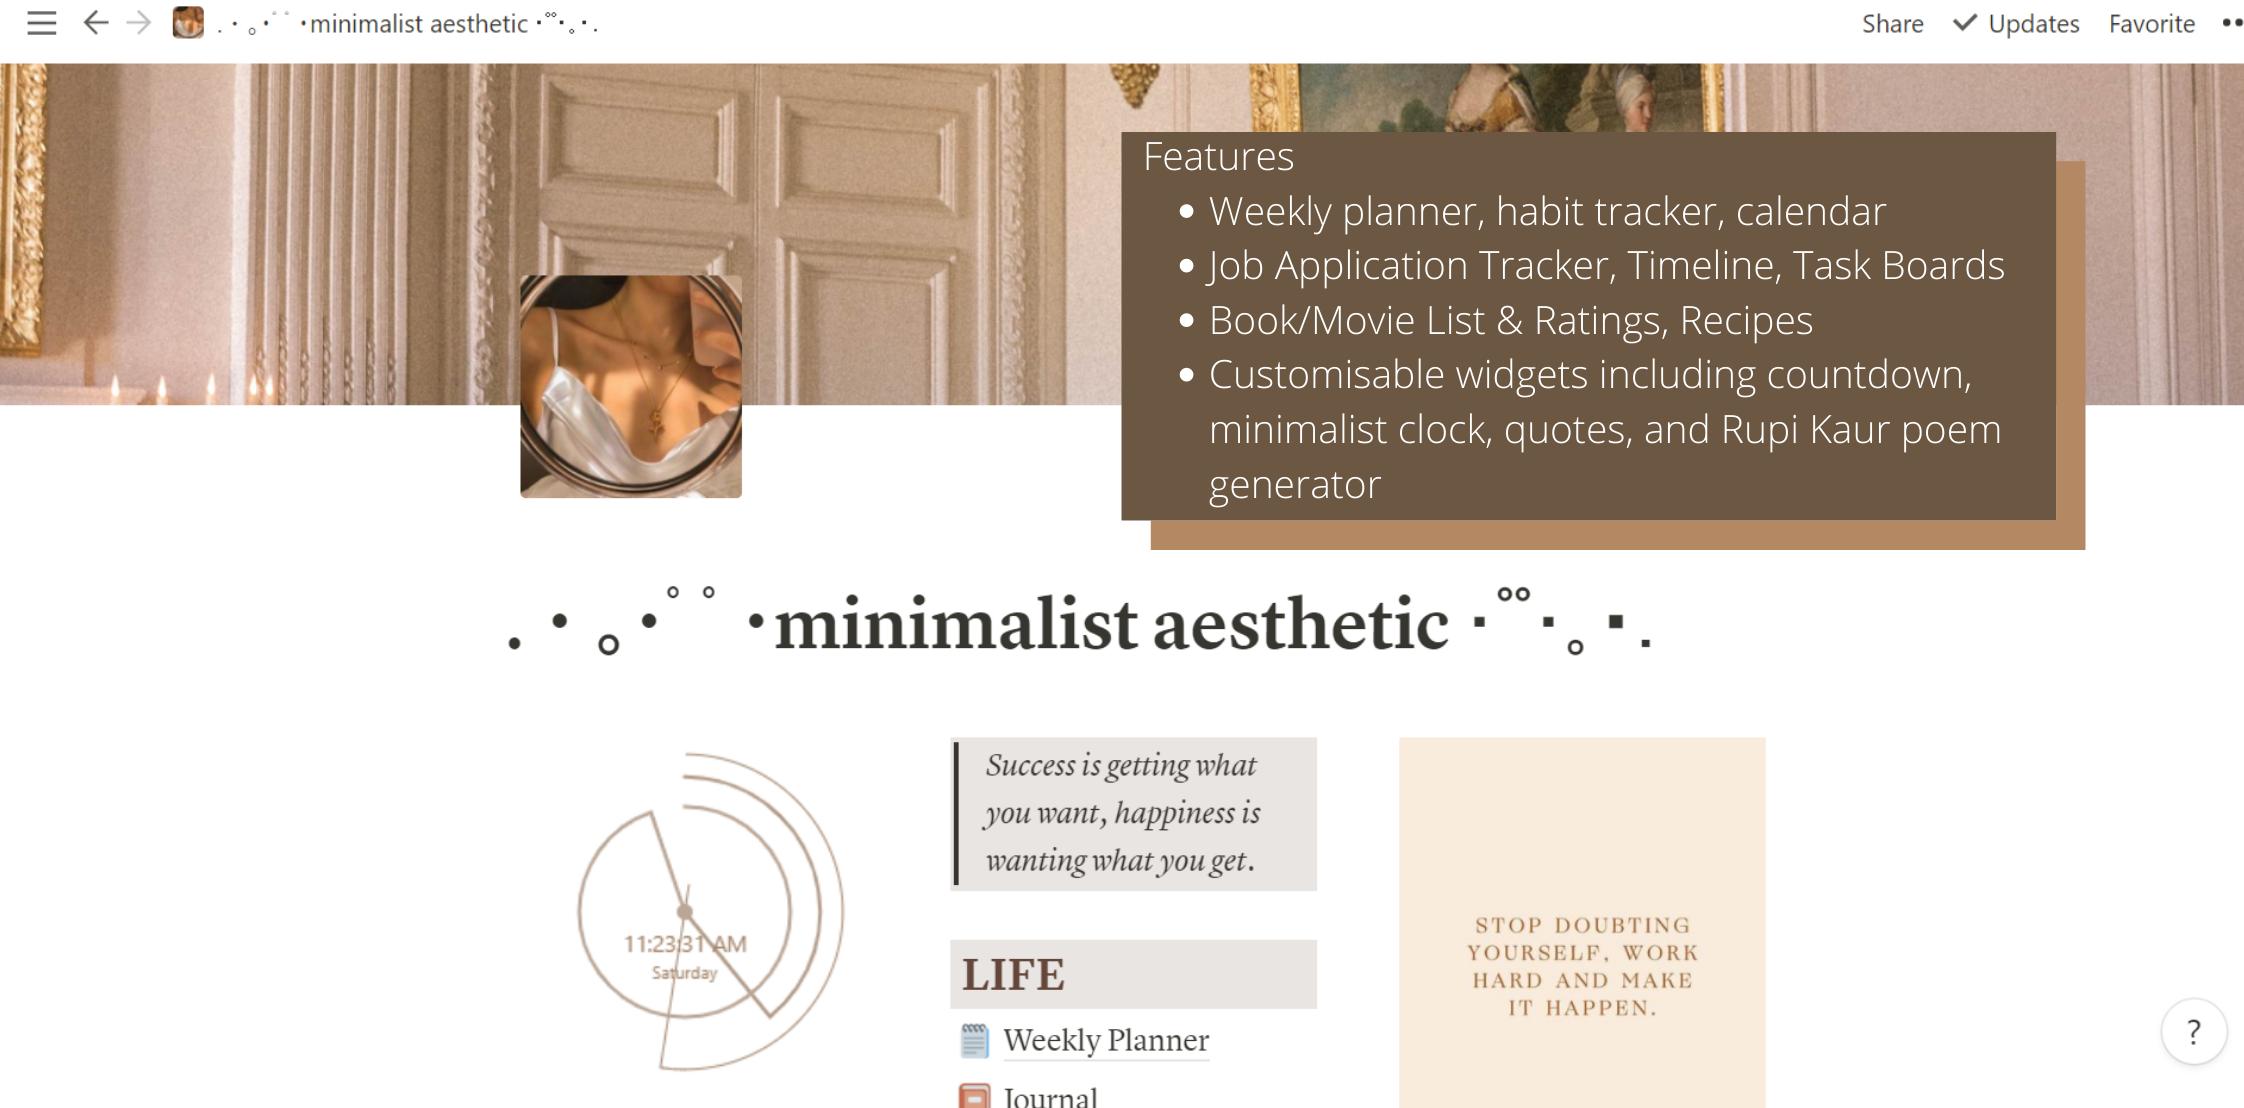 minimalist aesthetic dashboard